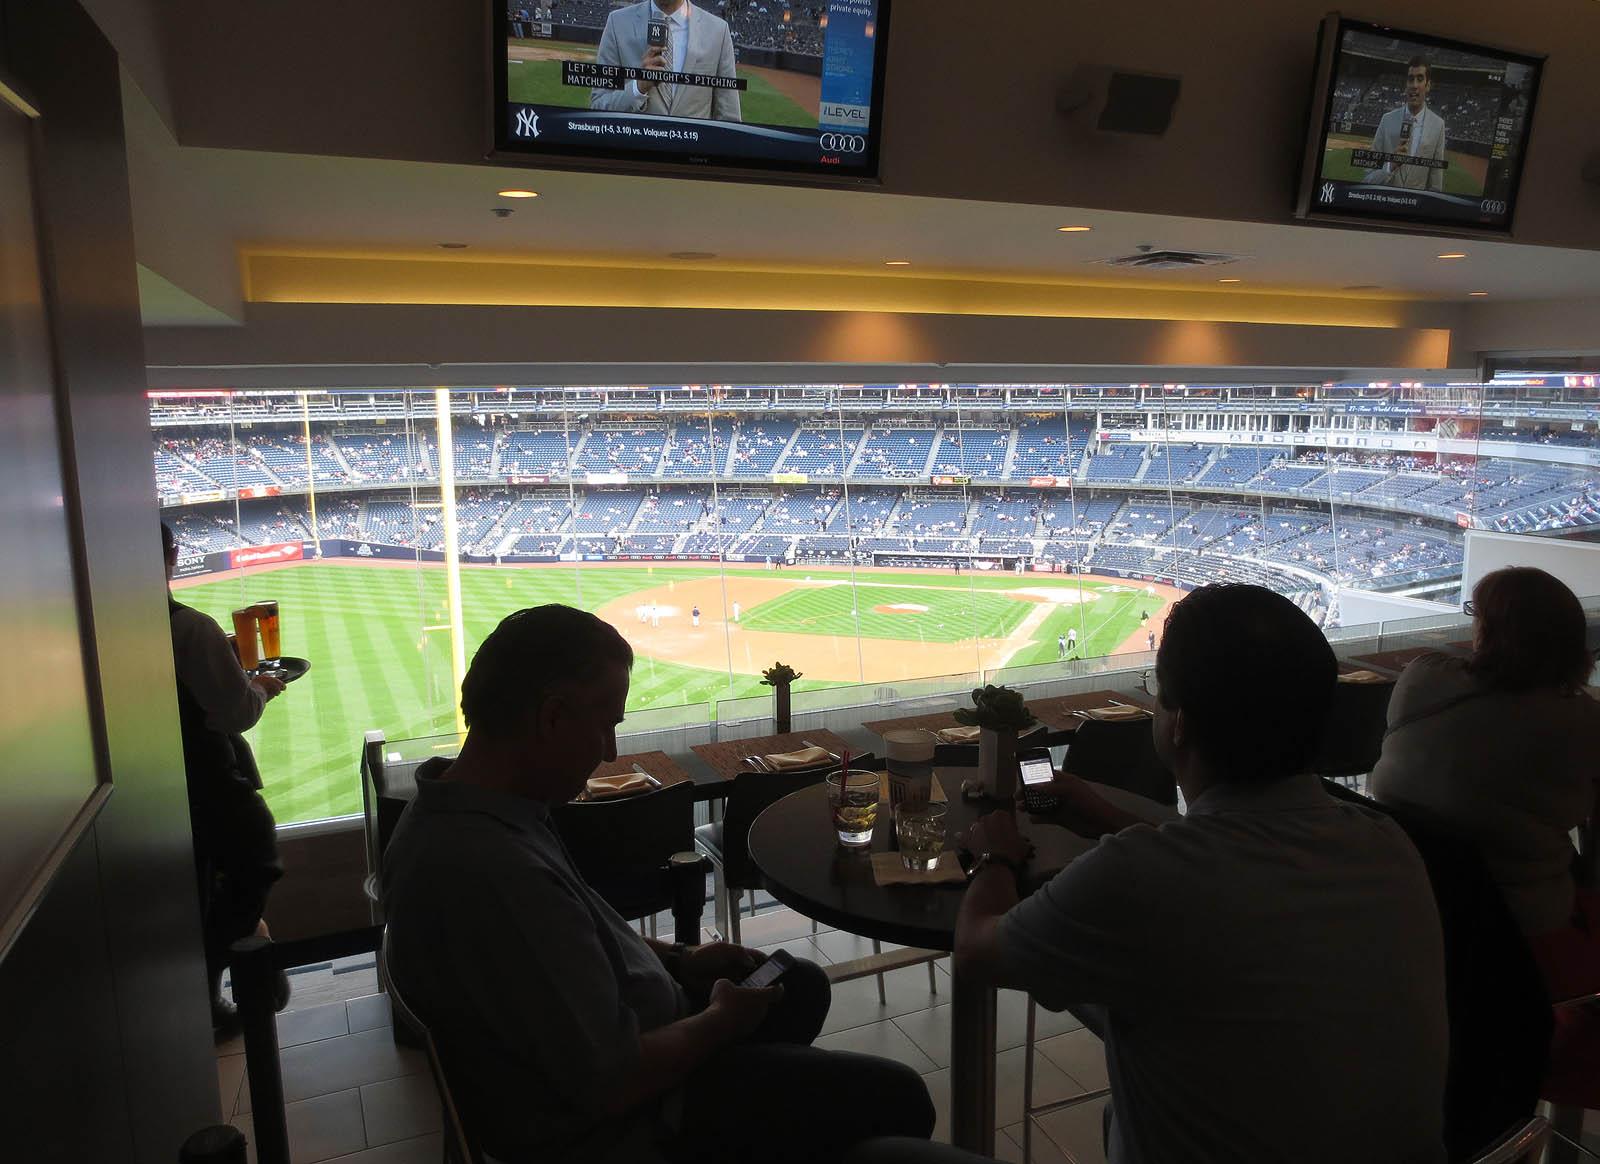 5/16/13 at Yankee Stadium | The Baseball Collector